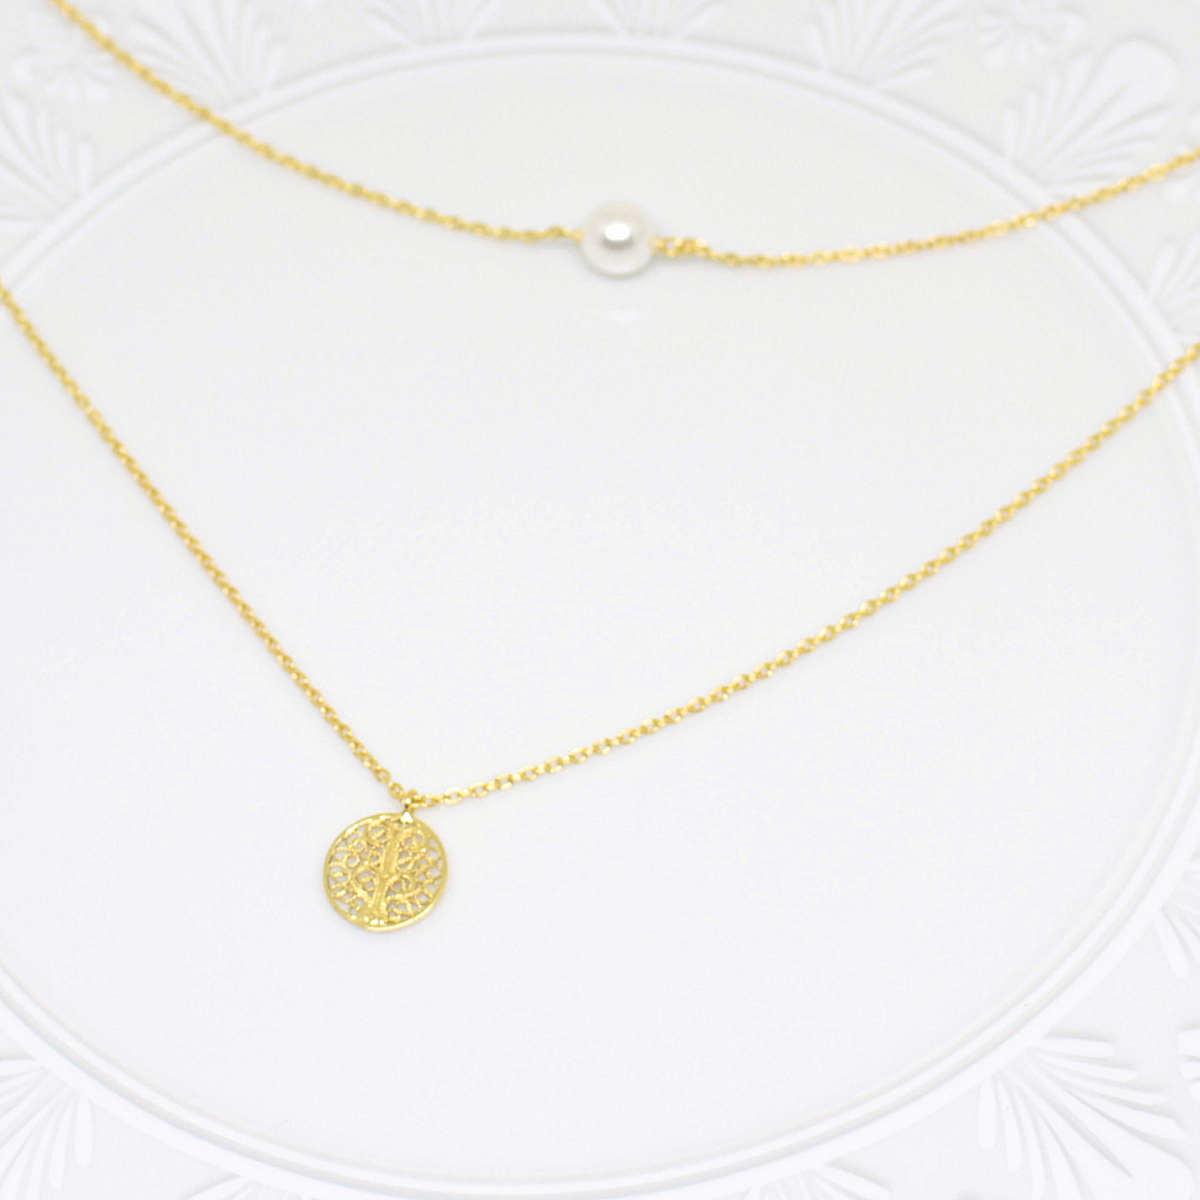 SOPHIA インティメイト ネックレス ゴールド/銀線細工・金線細工